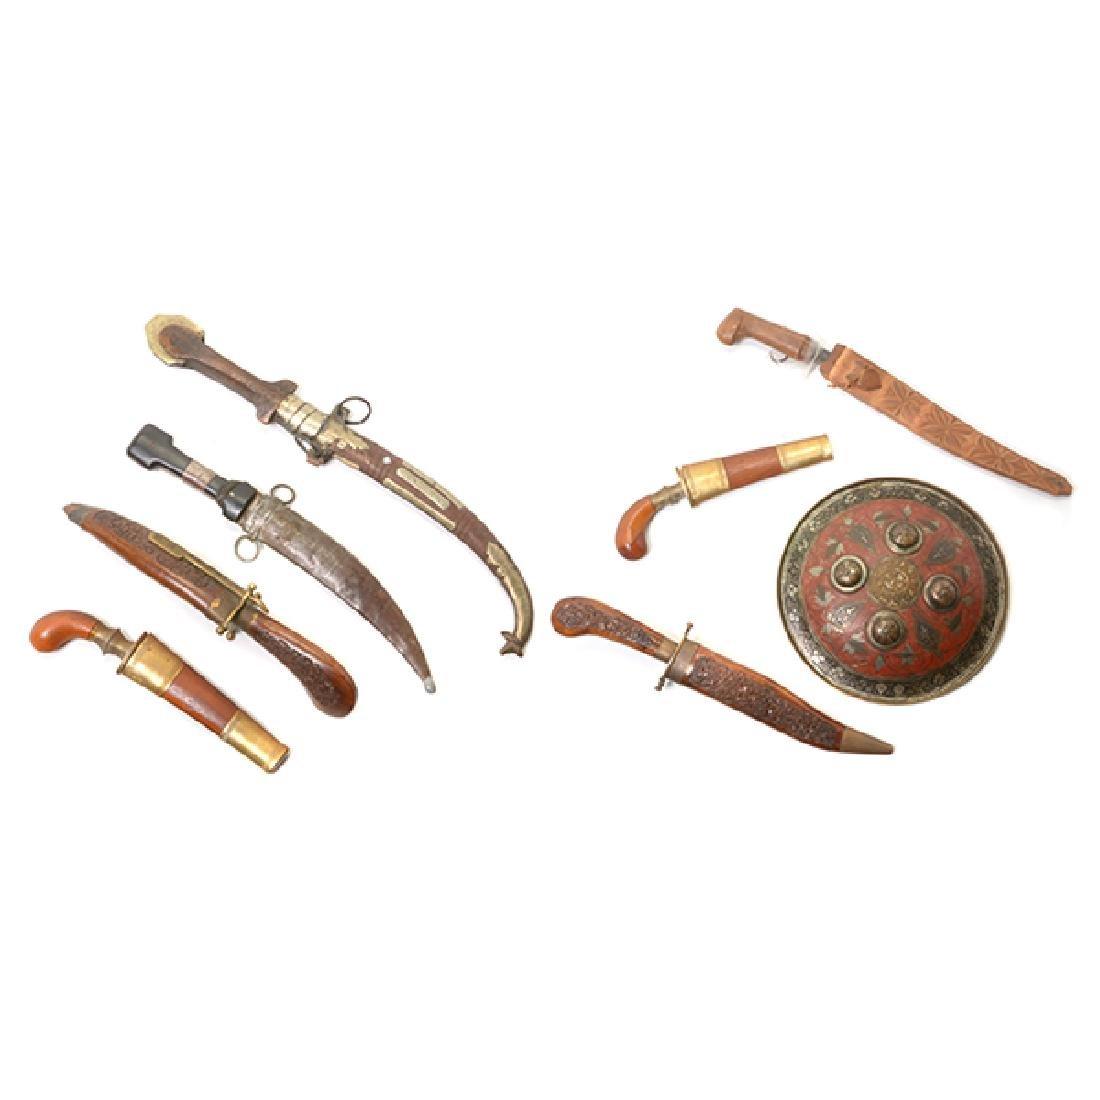 Seven Handmade Daggers and an Indian Shield